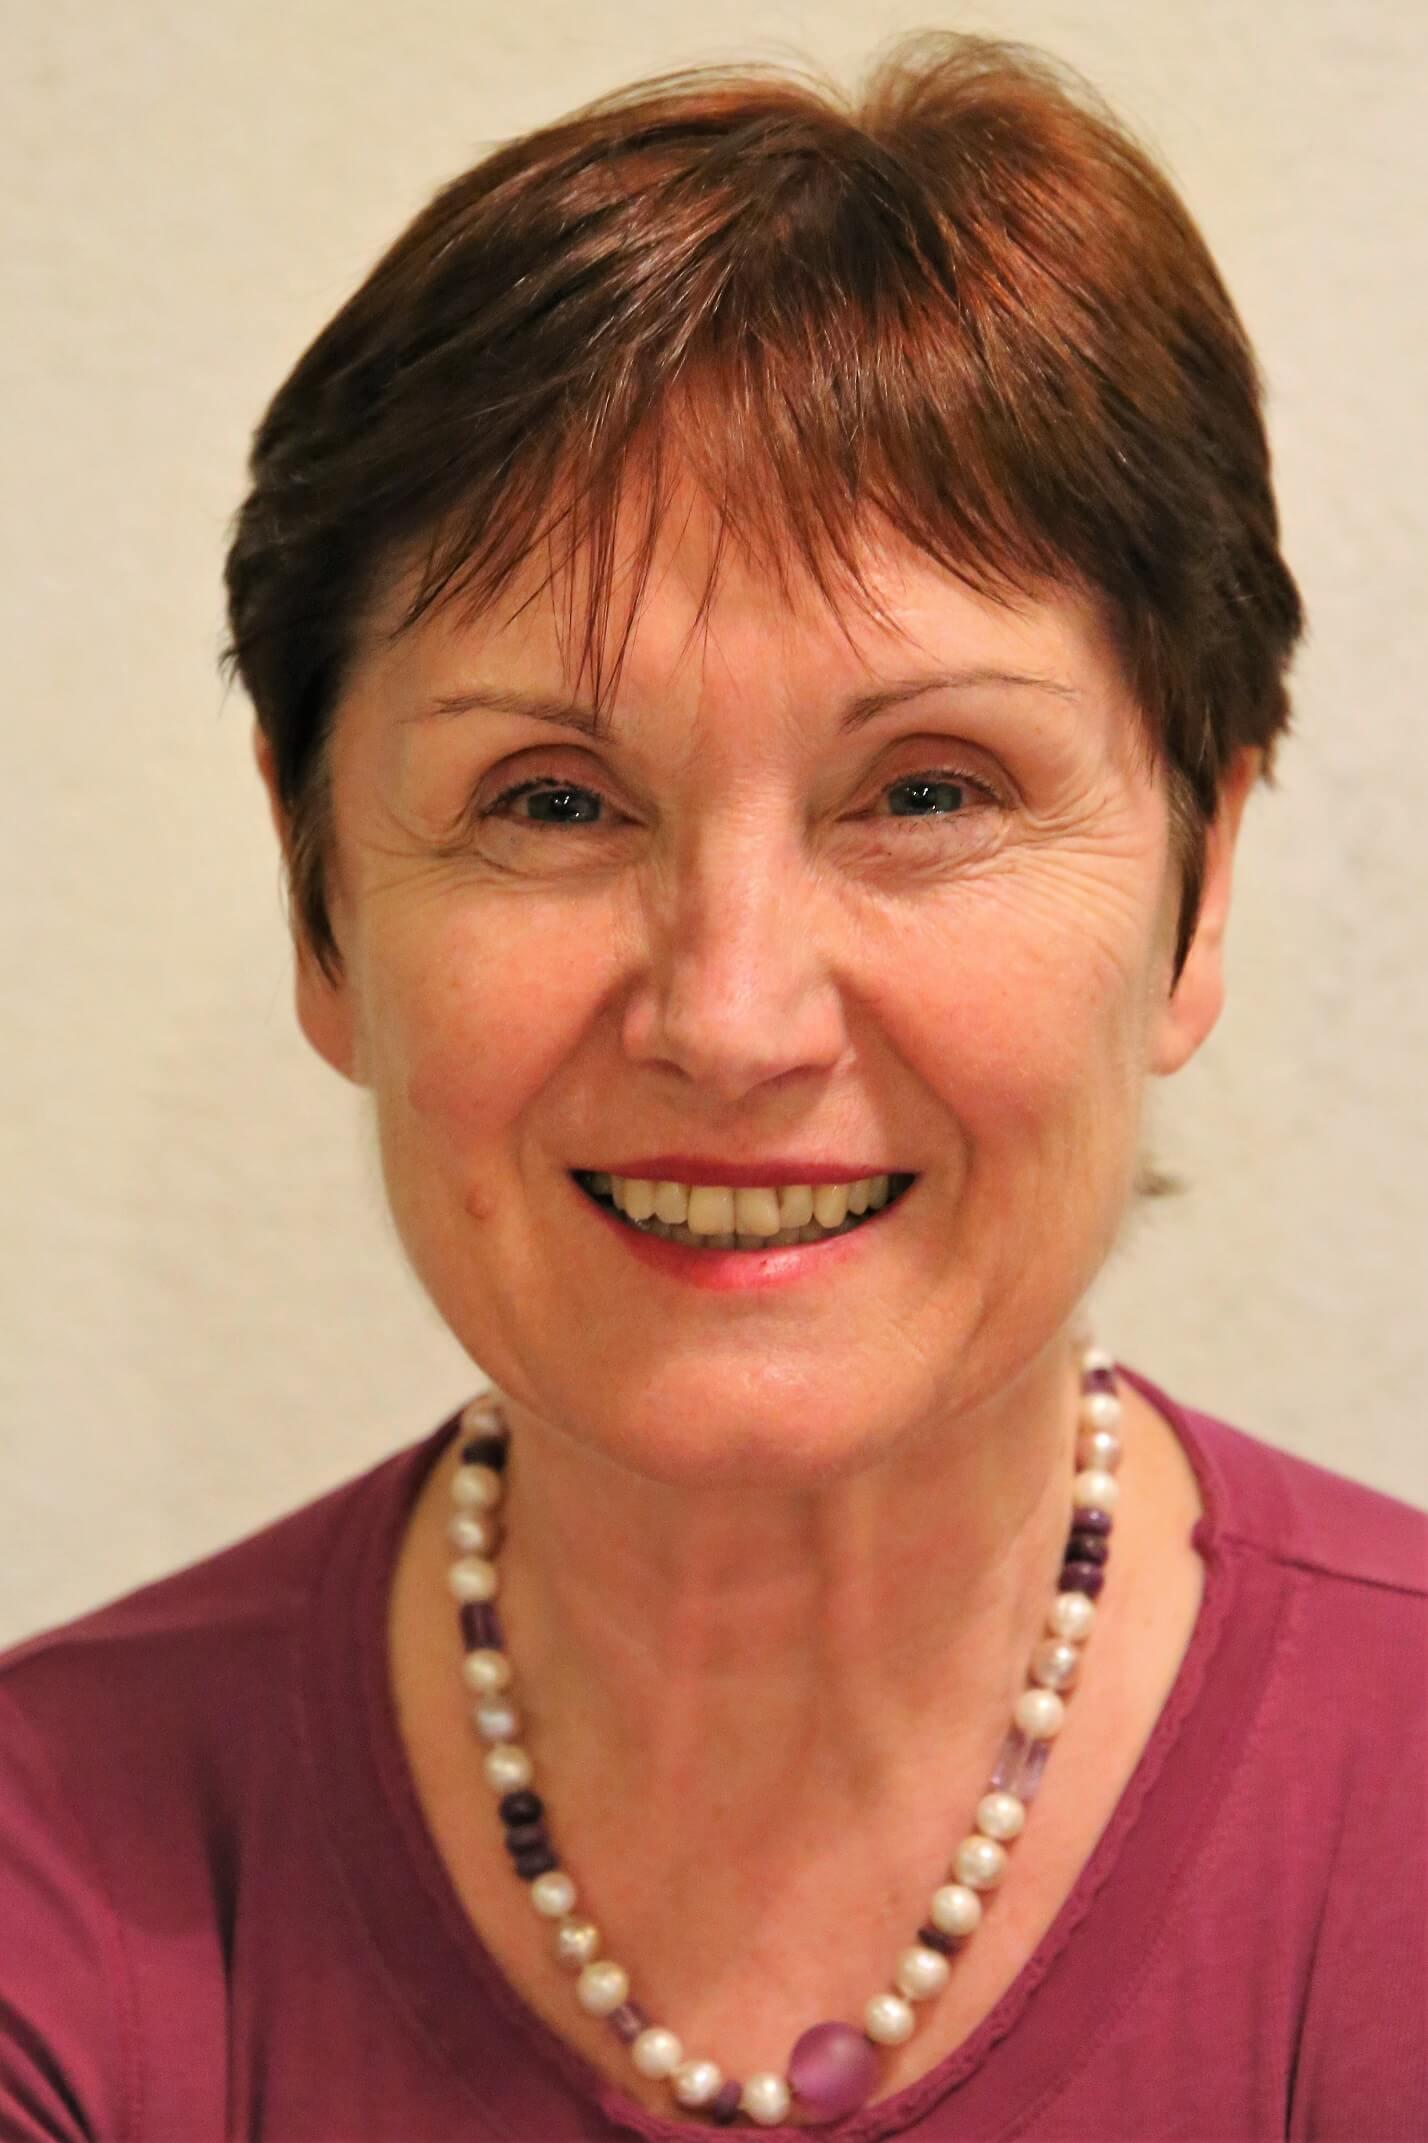 Gudrun Katzenbach